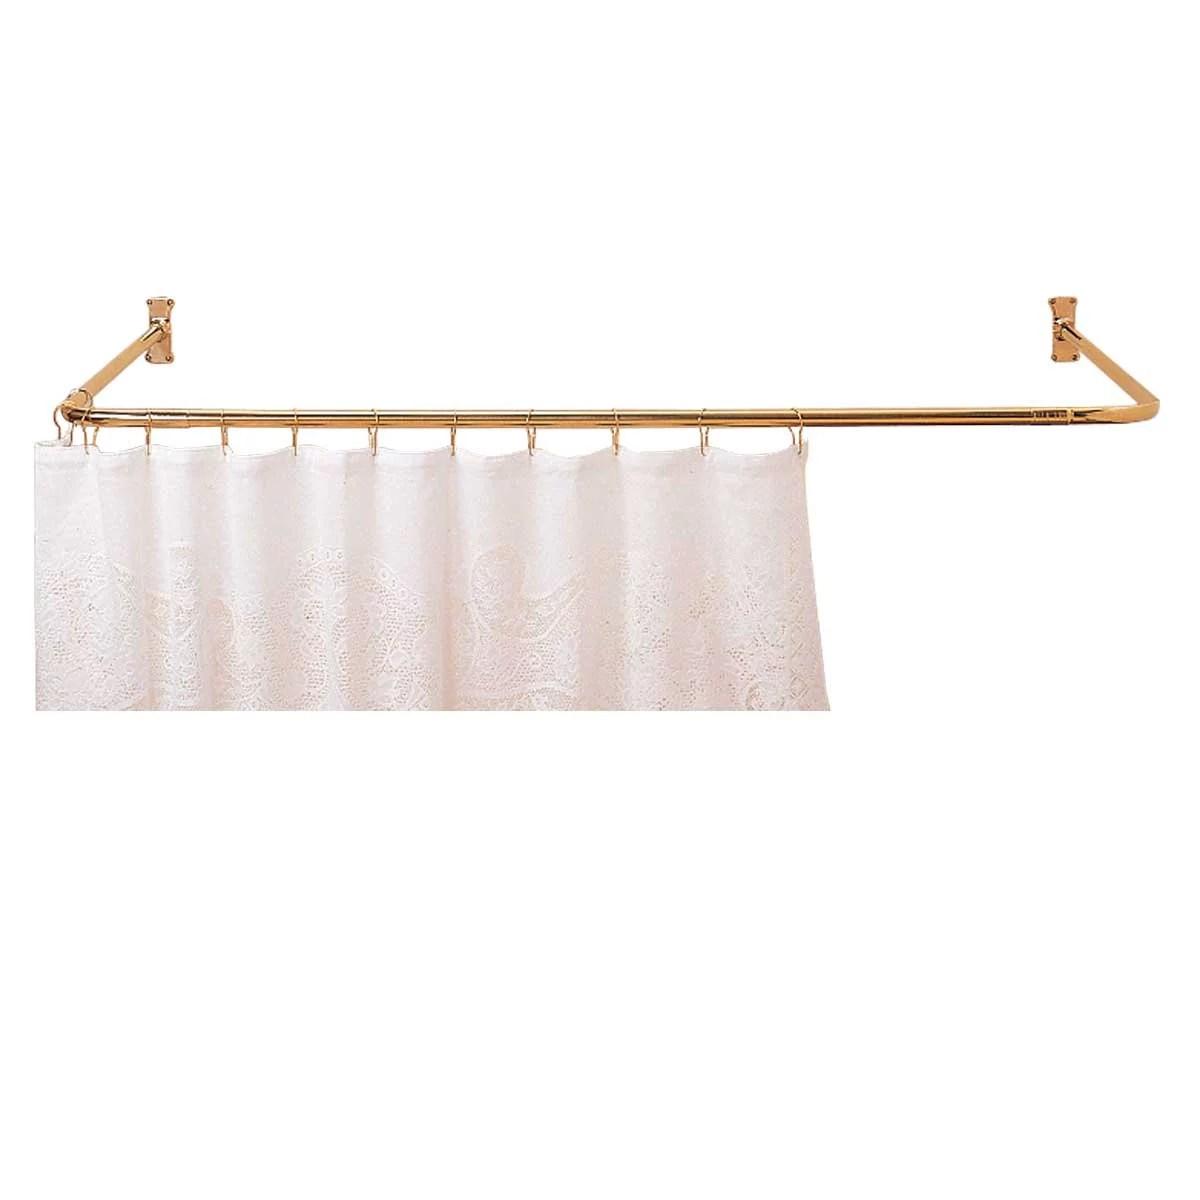 shower curtain rod bright solid brass 3 sided renovator s supply walmart com